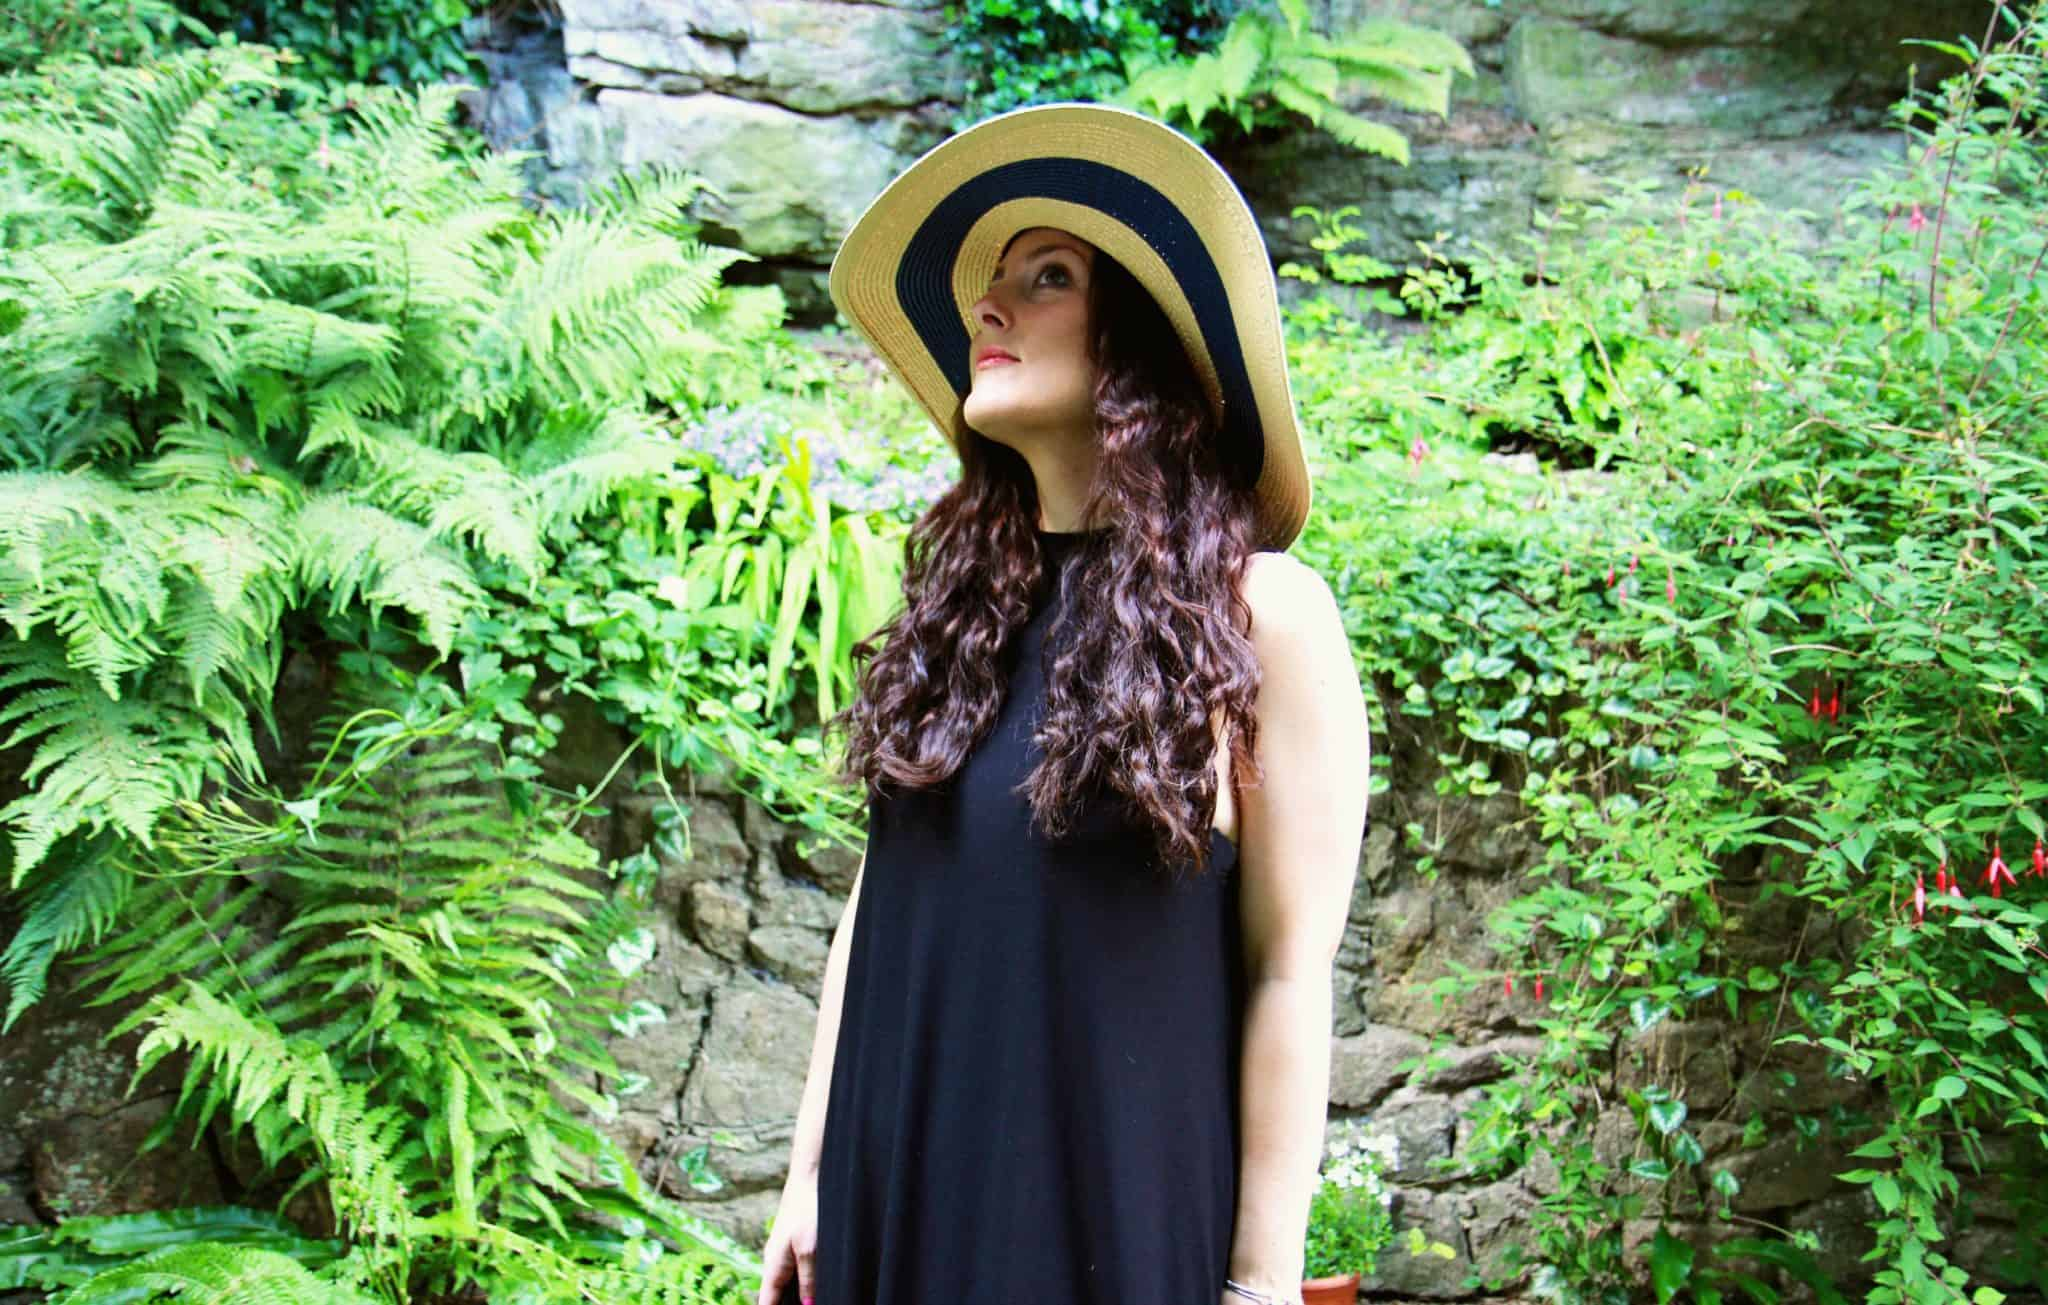 Black tiptop high neck dress, Jules striped floppy hat, red Saltwater sandals